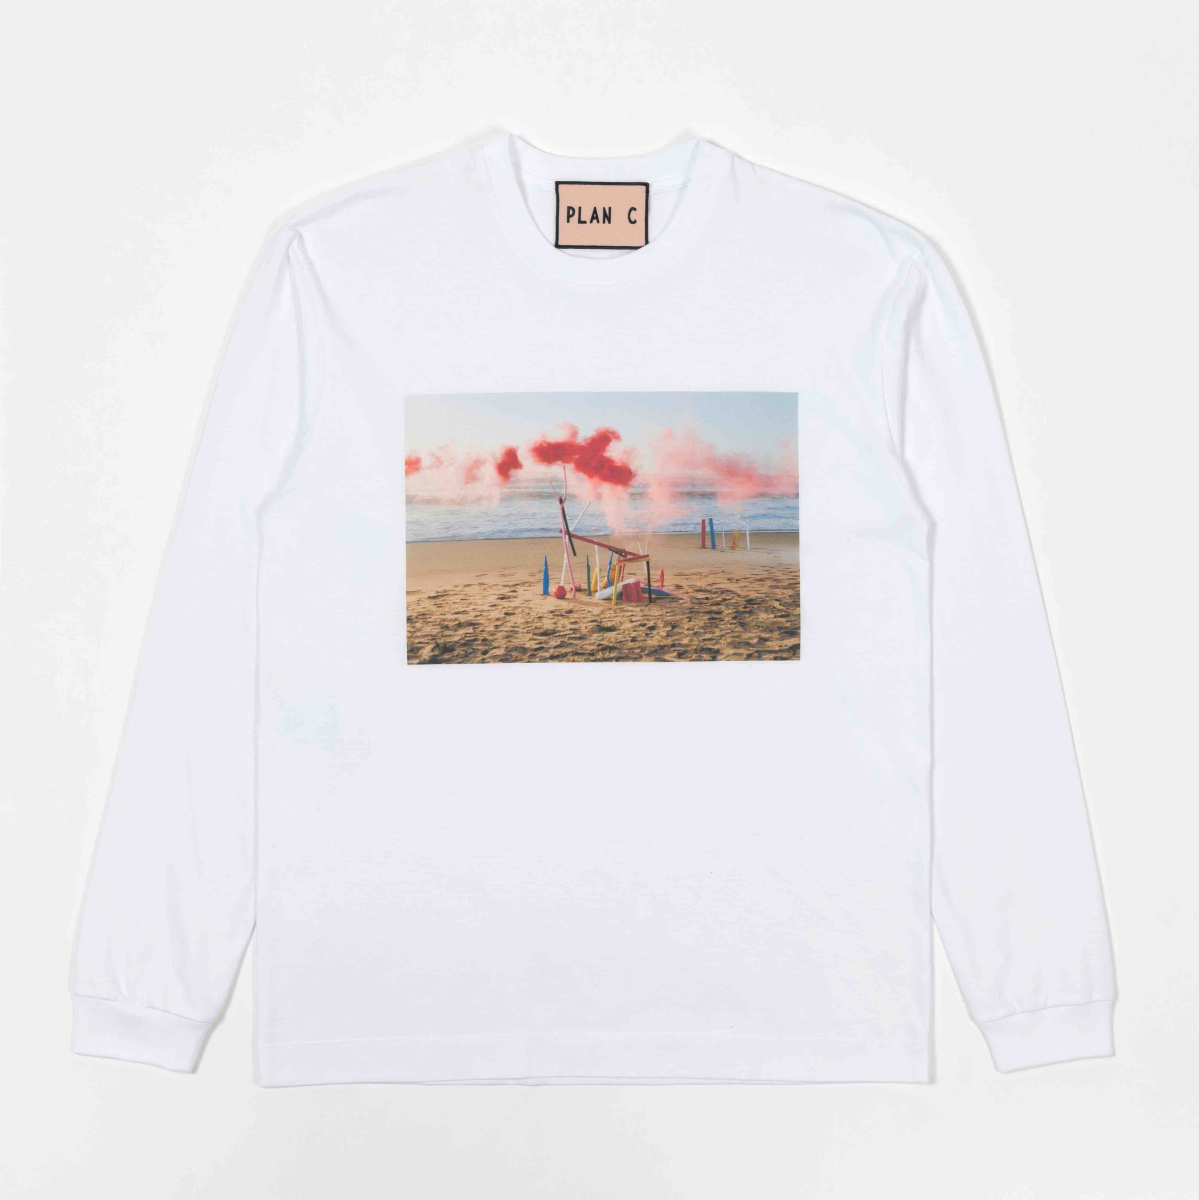 Tシャツ(長袖)¥31,900(※日本公式オンラインストア限定アイテム)/パラグラフ(プランシー)